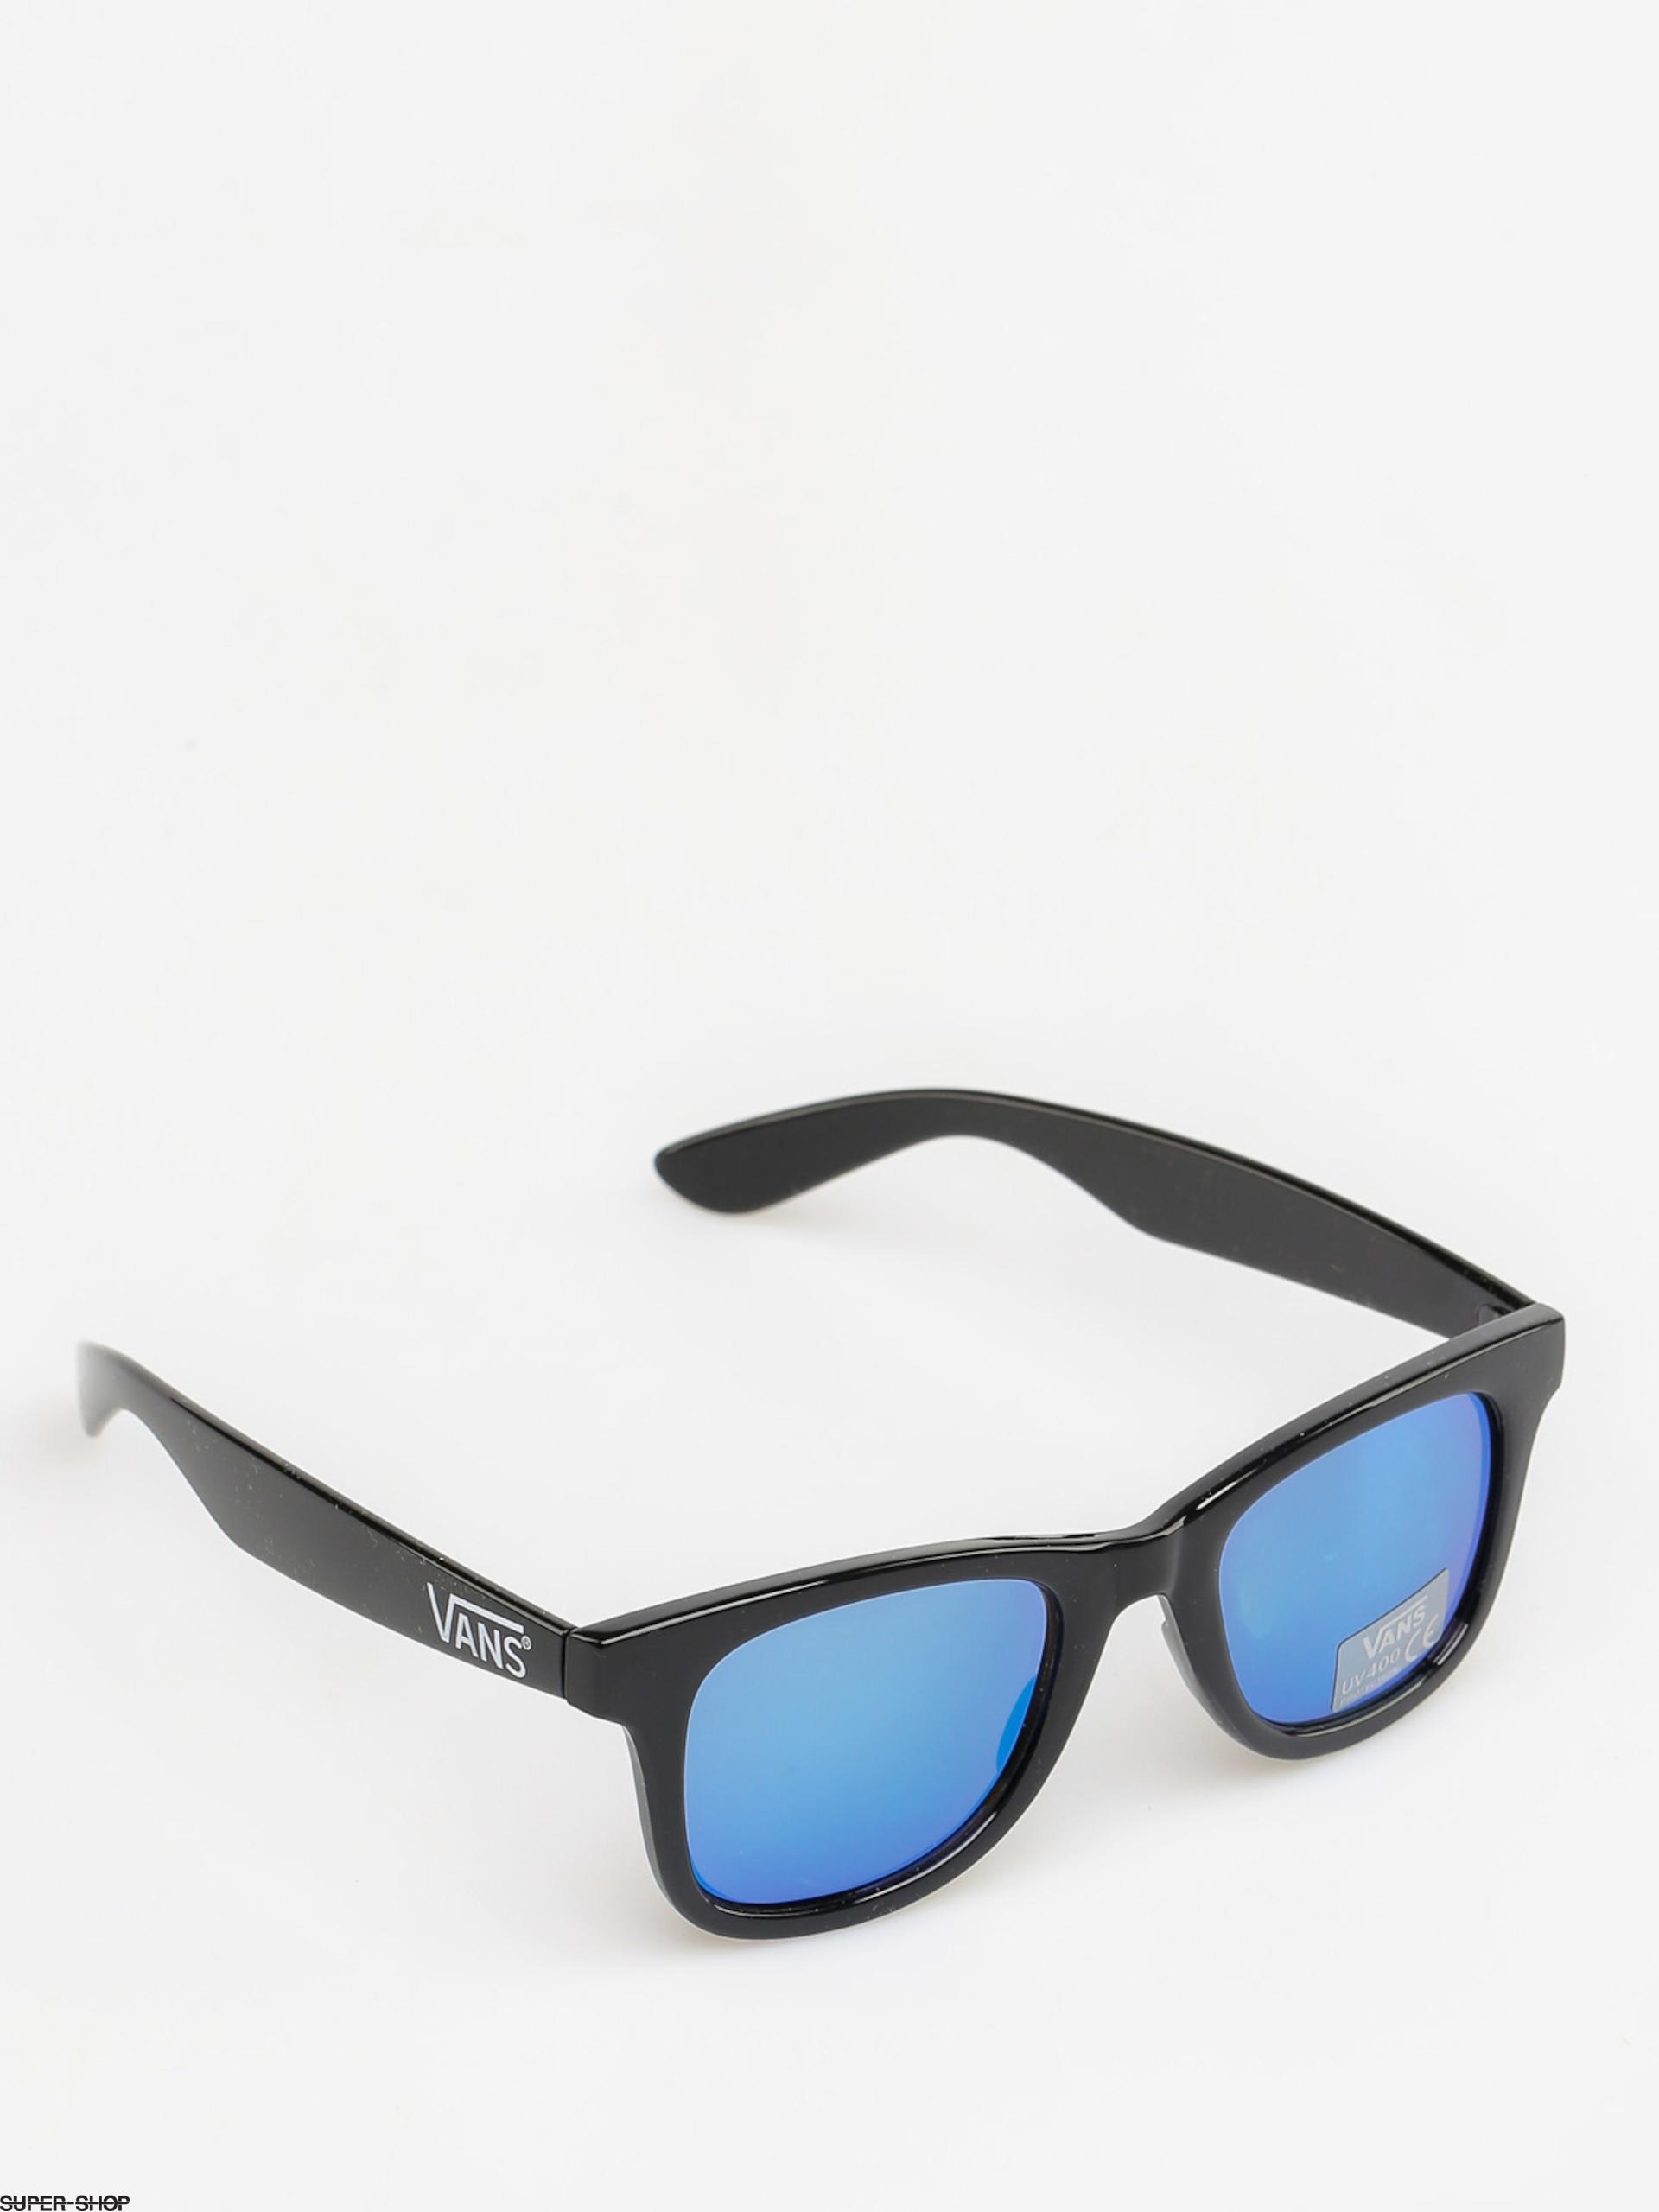 6637b5dba15 Vans Sunglasses Janelle Hipster Wmn (black gradient)